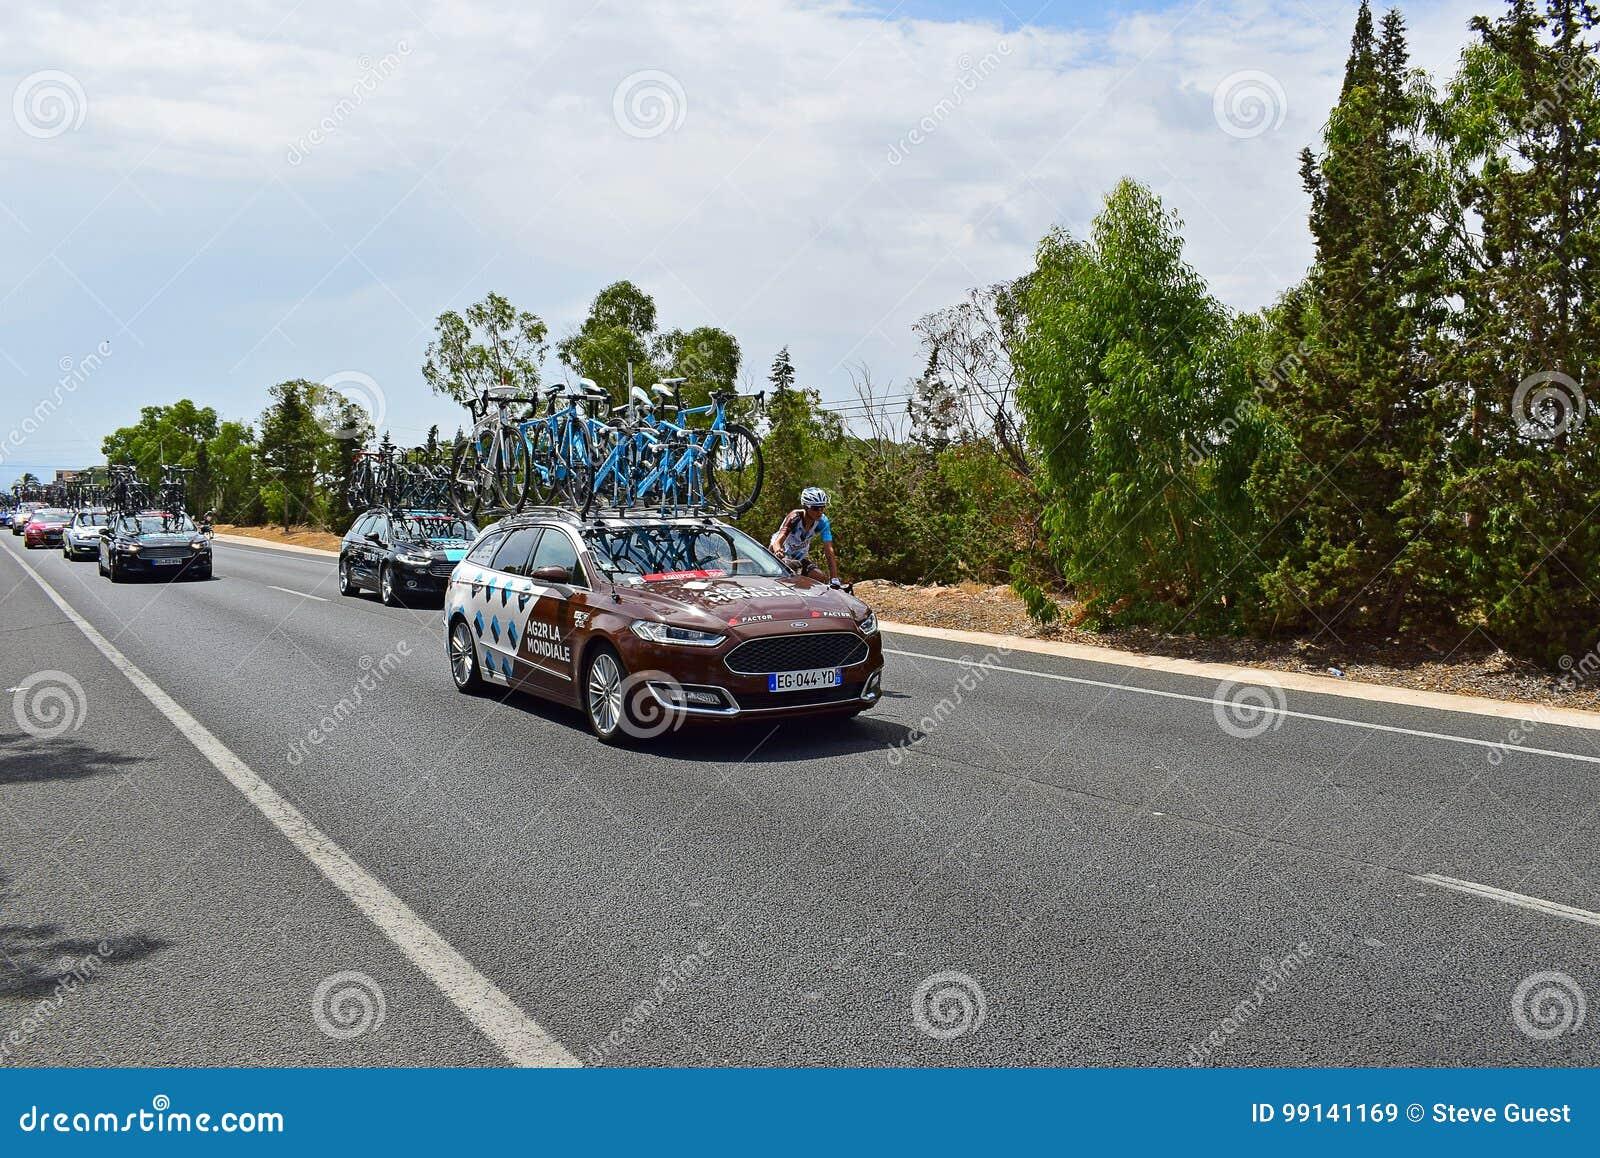 AG2R-LaMondiale bil och Rider La Vuelta España